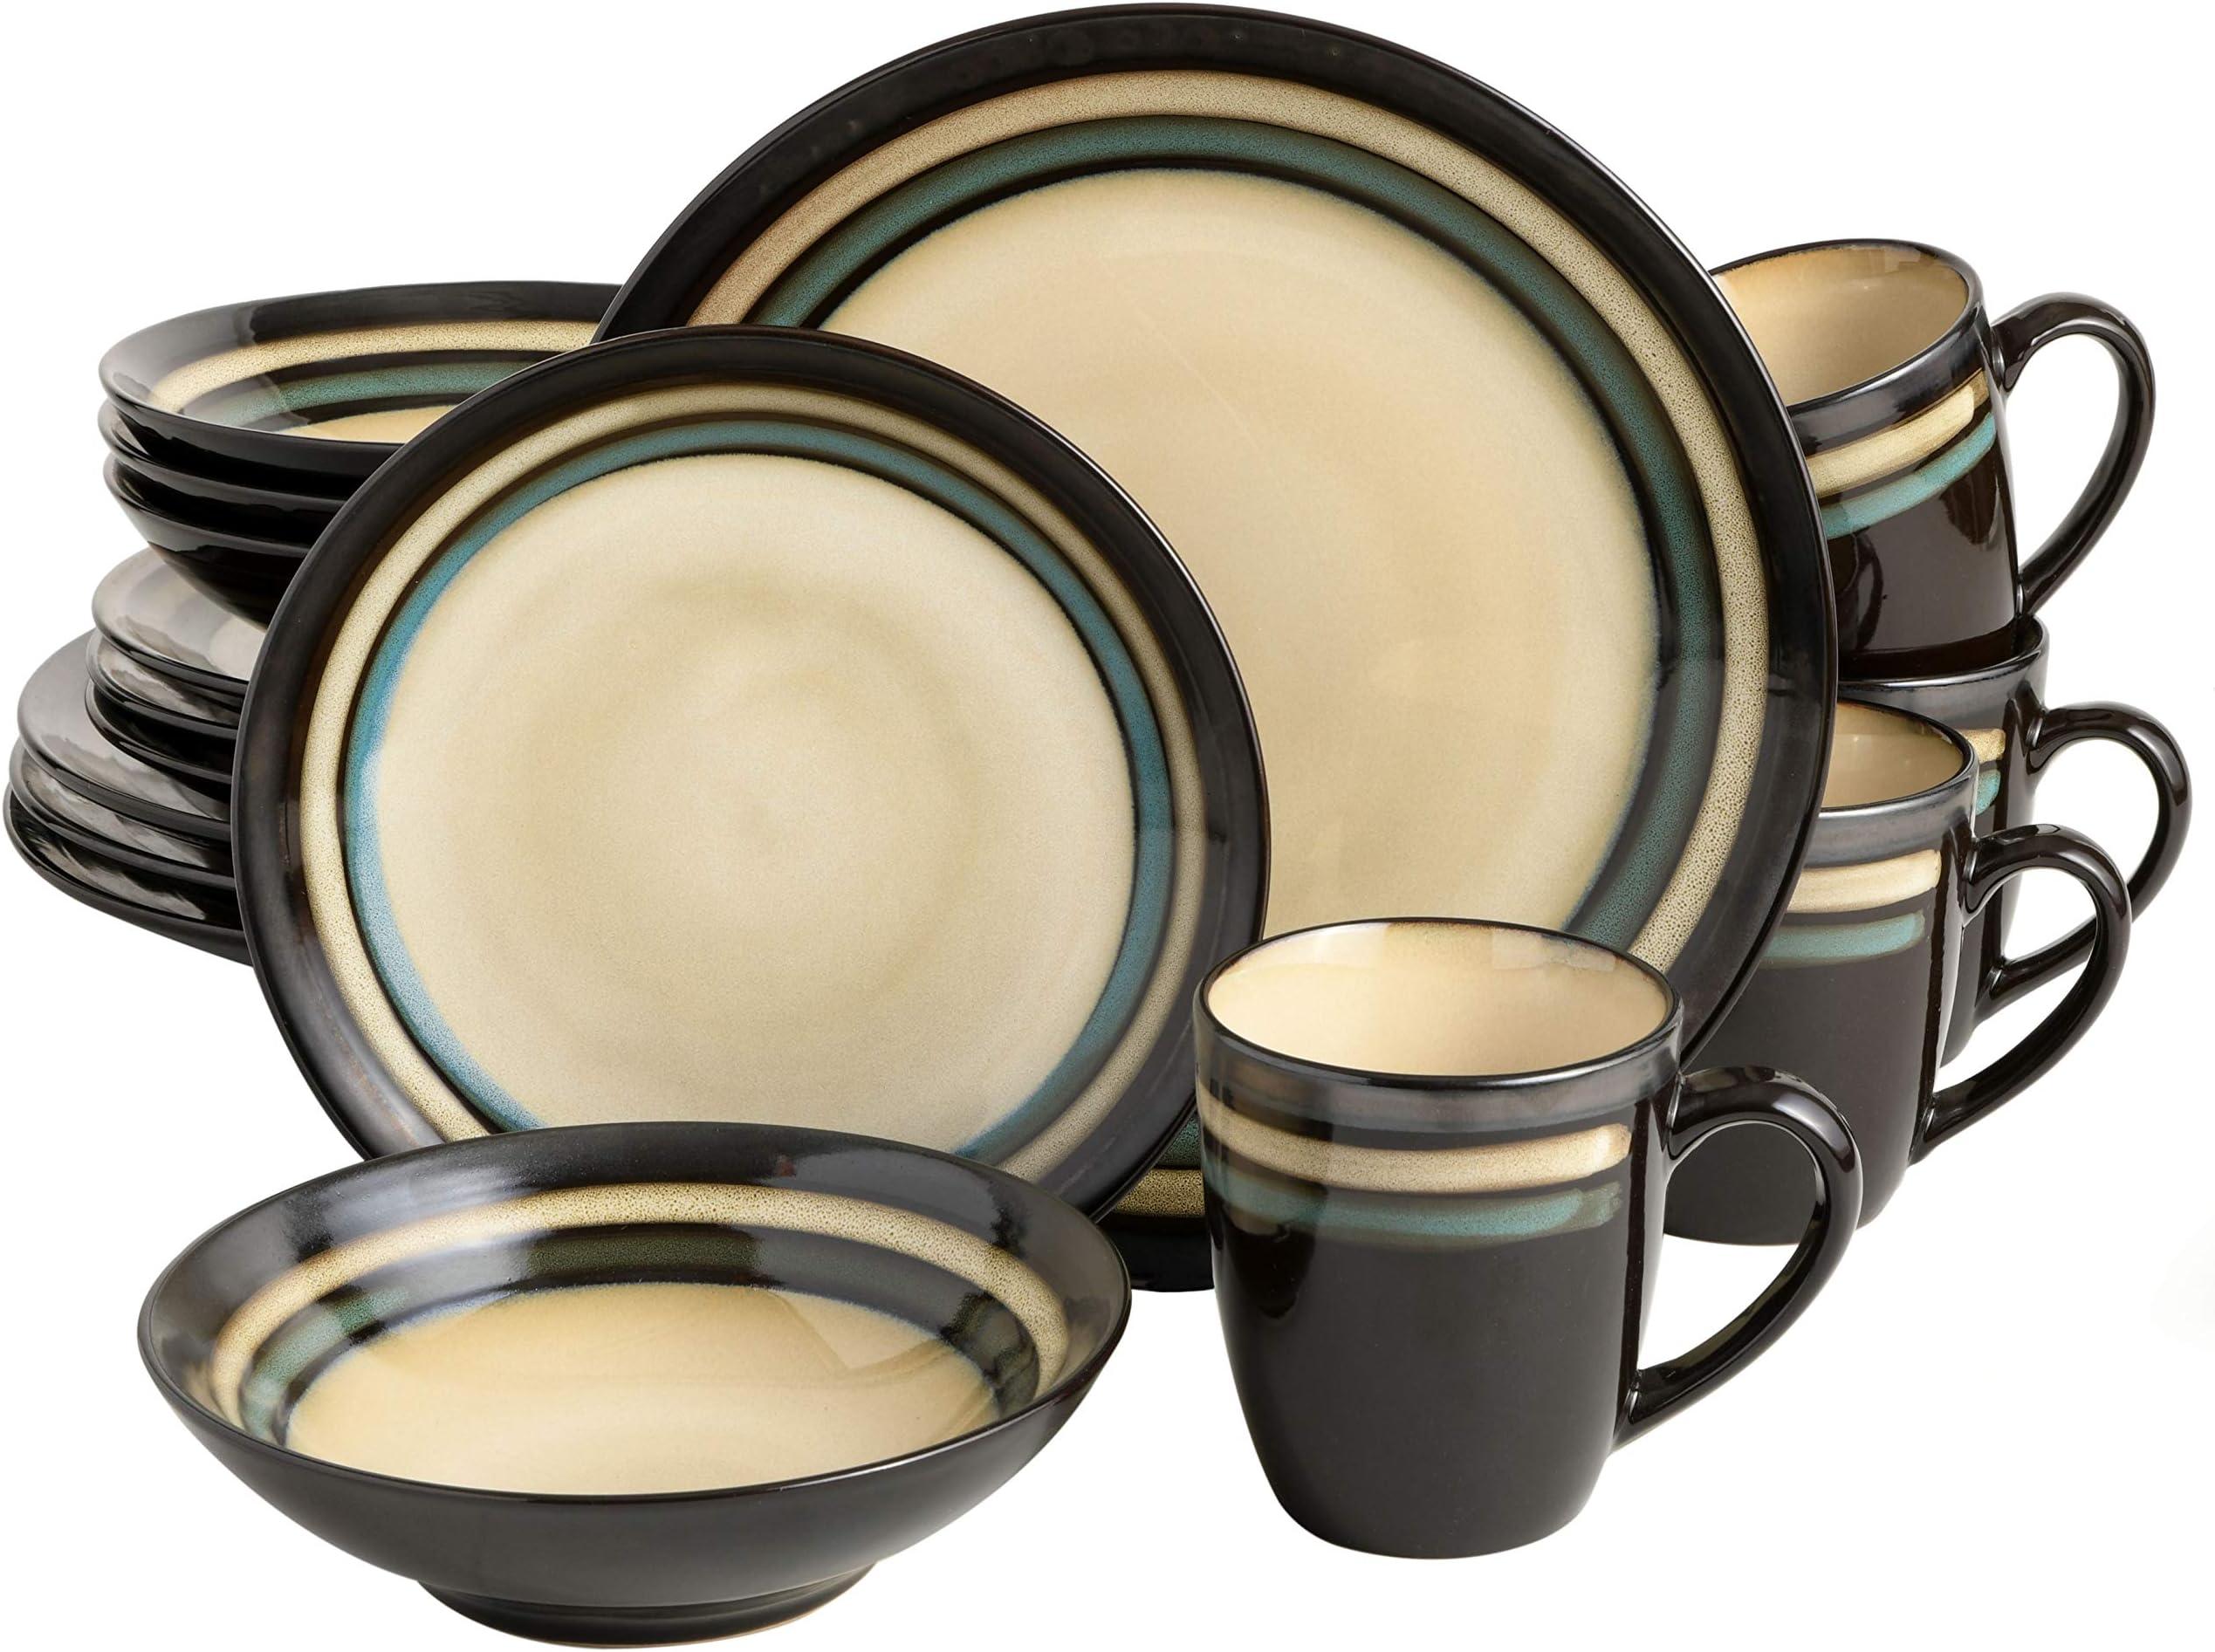 Set of 4 Banded Rings Dessert Plates